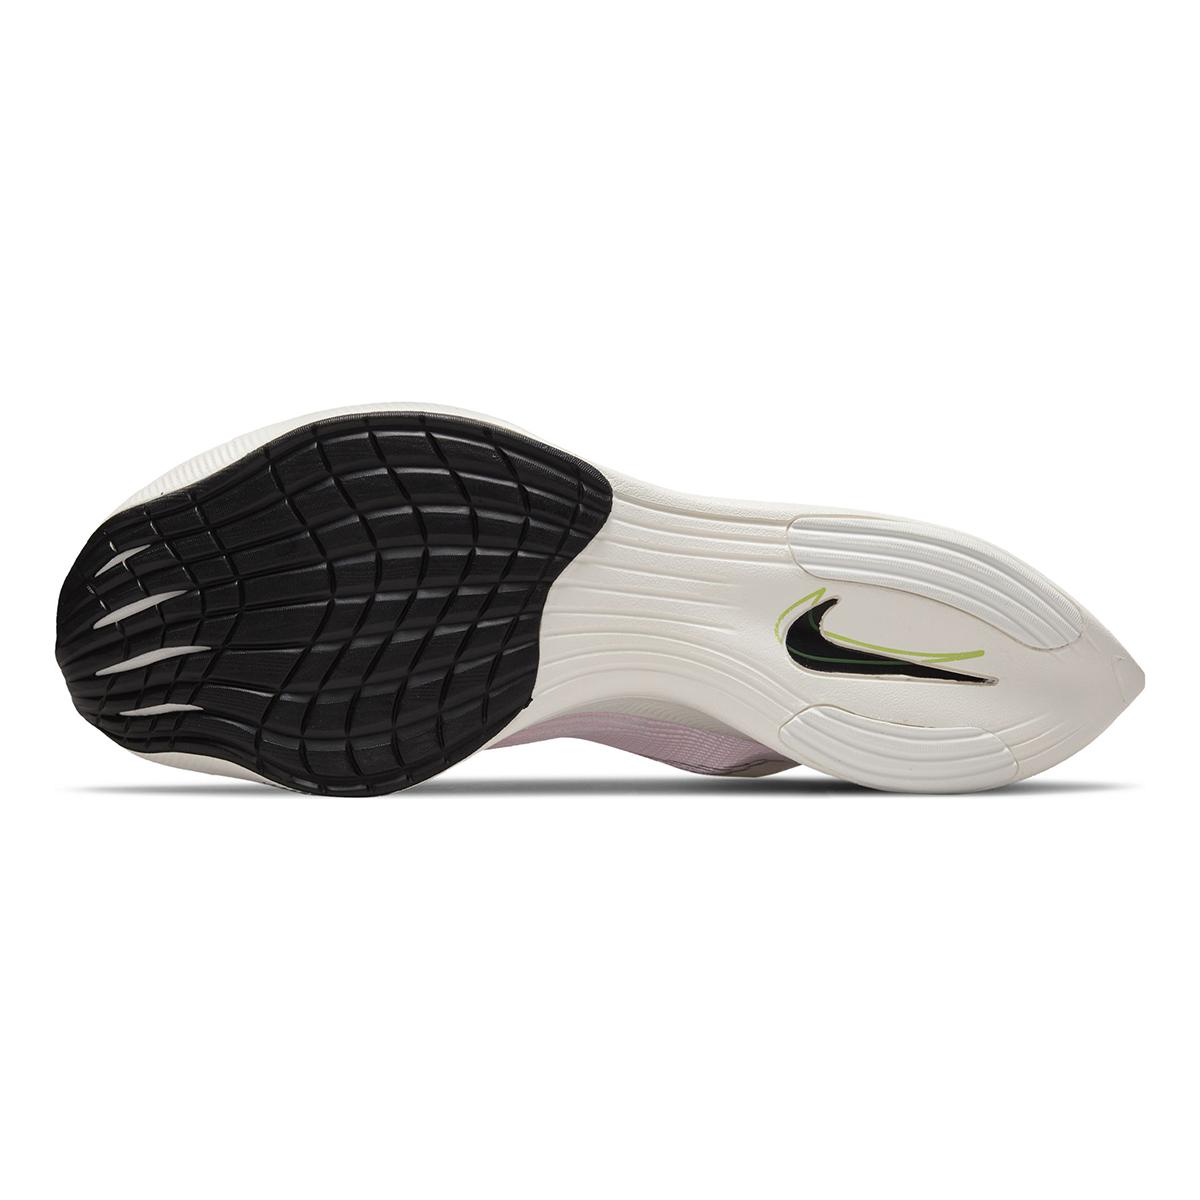 Men's Nike ZoomX Vaporfly Next% 2 Running Shoe - Color: Rawdacious - Size: 6 - Width: Regular, Rawdacious, large, image 3